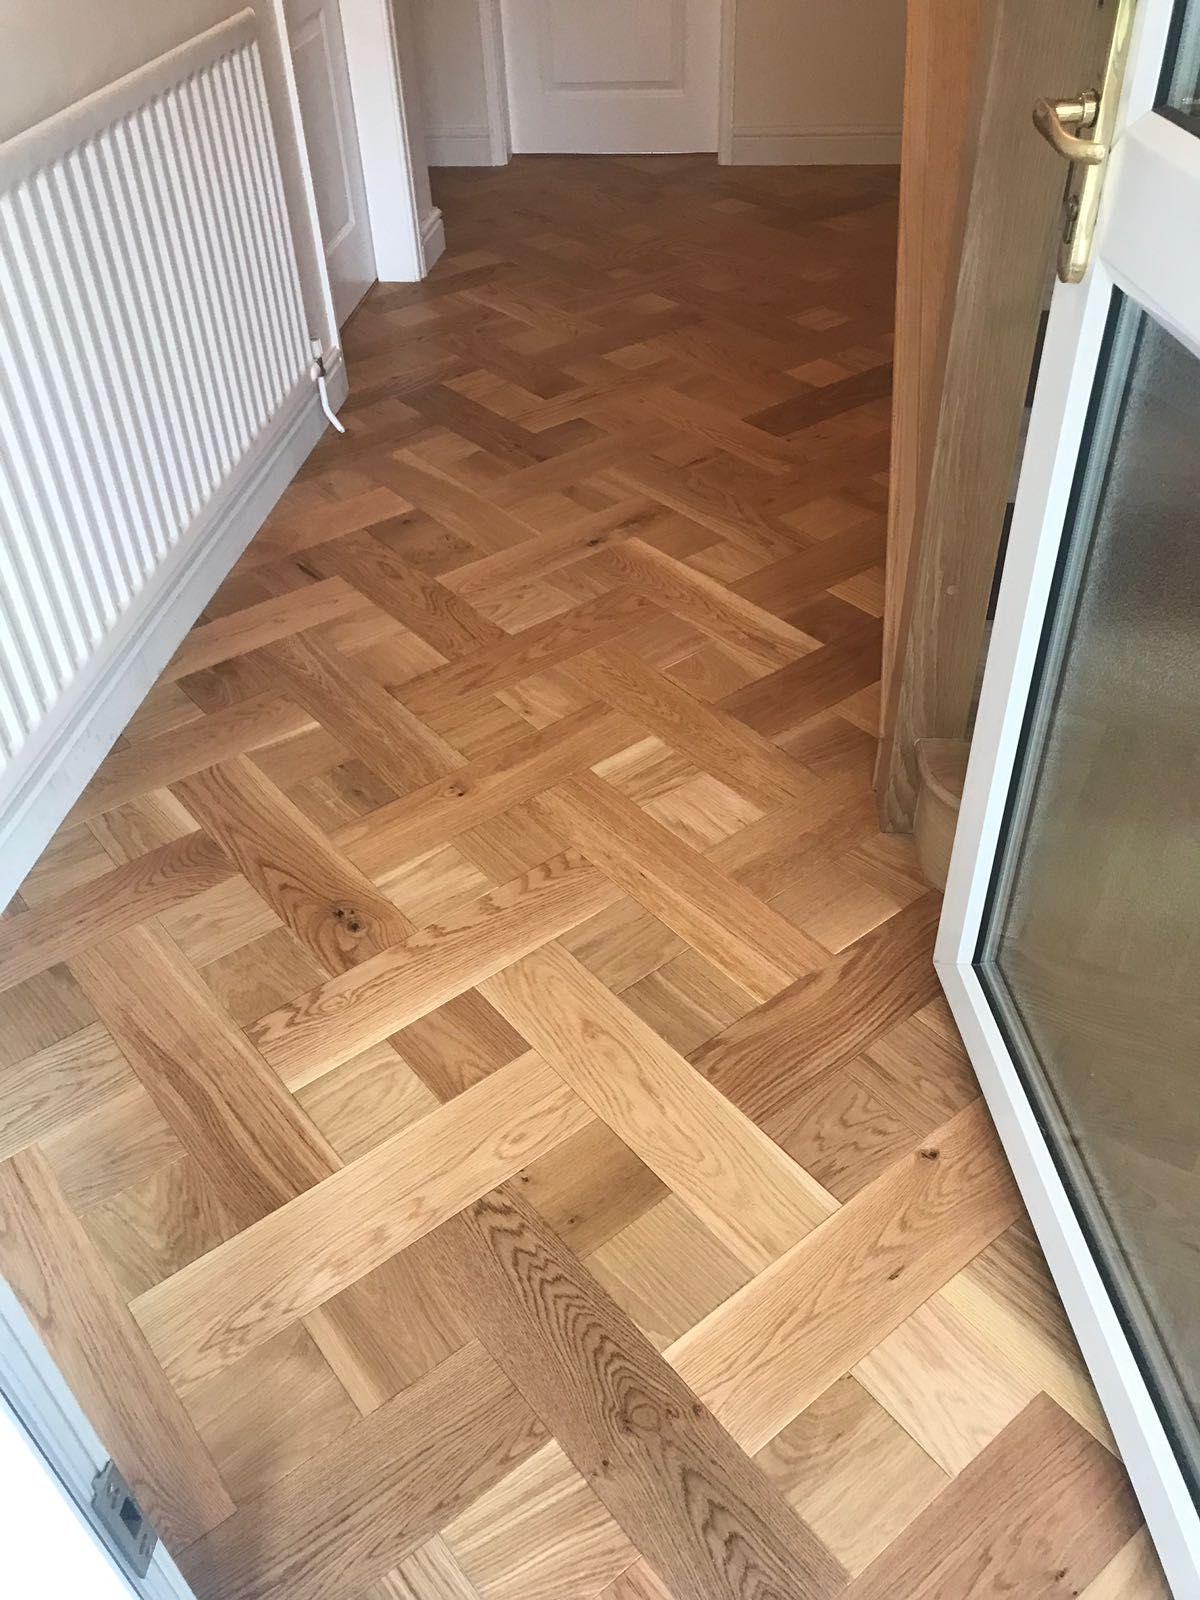 Ted Todd Sandbank Create Fitted In Basket Weave Pattern For A Customer In Kirk Levington Floor Baskets Wood Flooring Company Wood Tile Floors